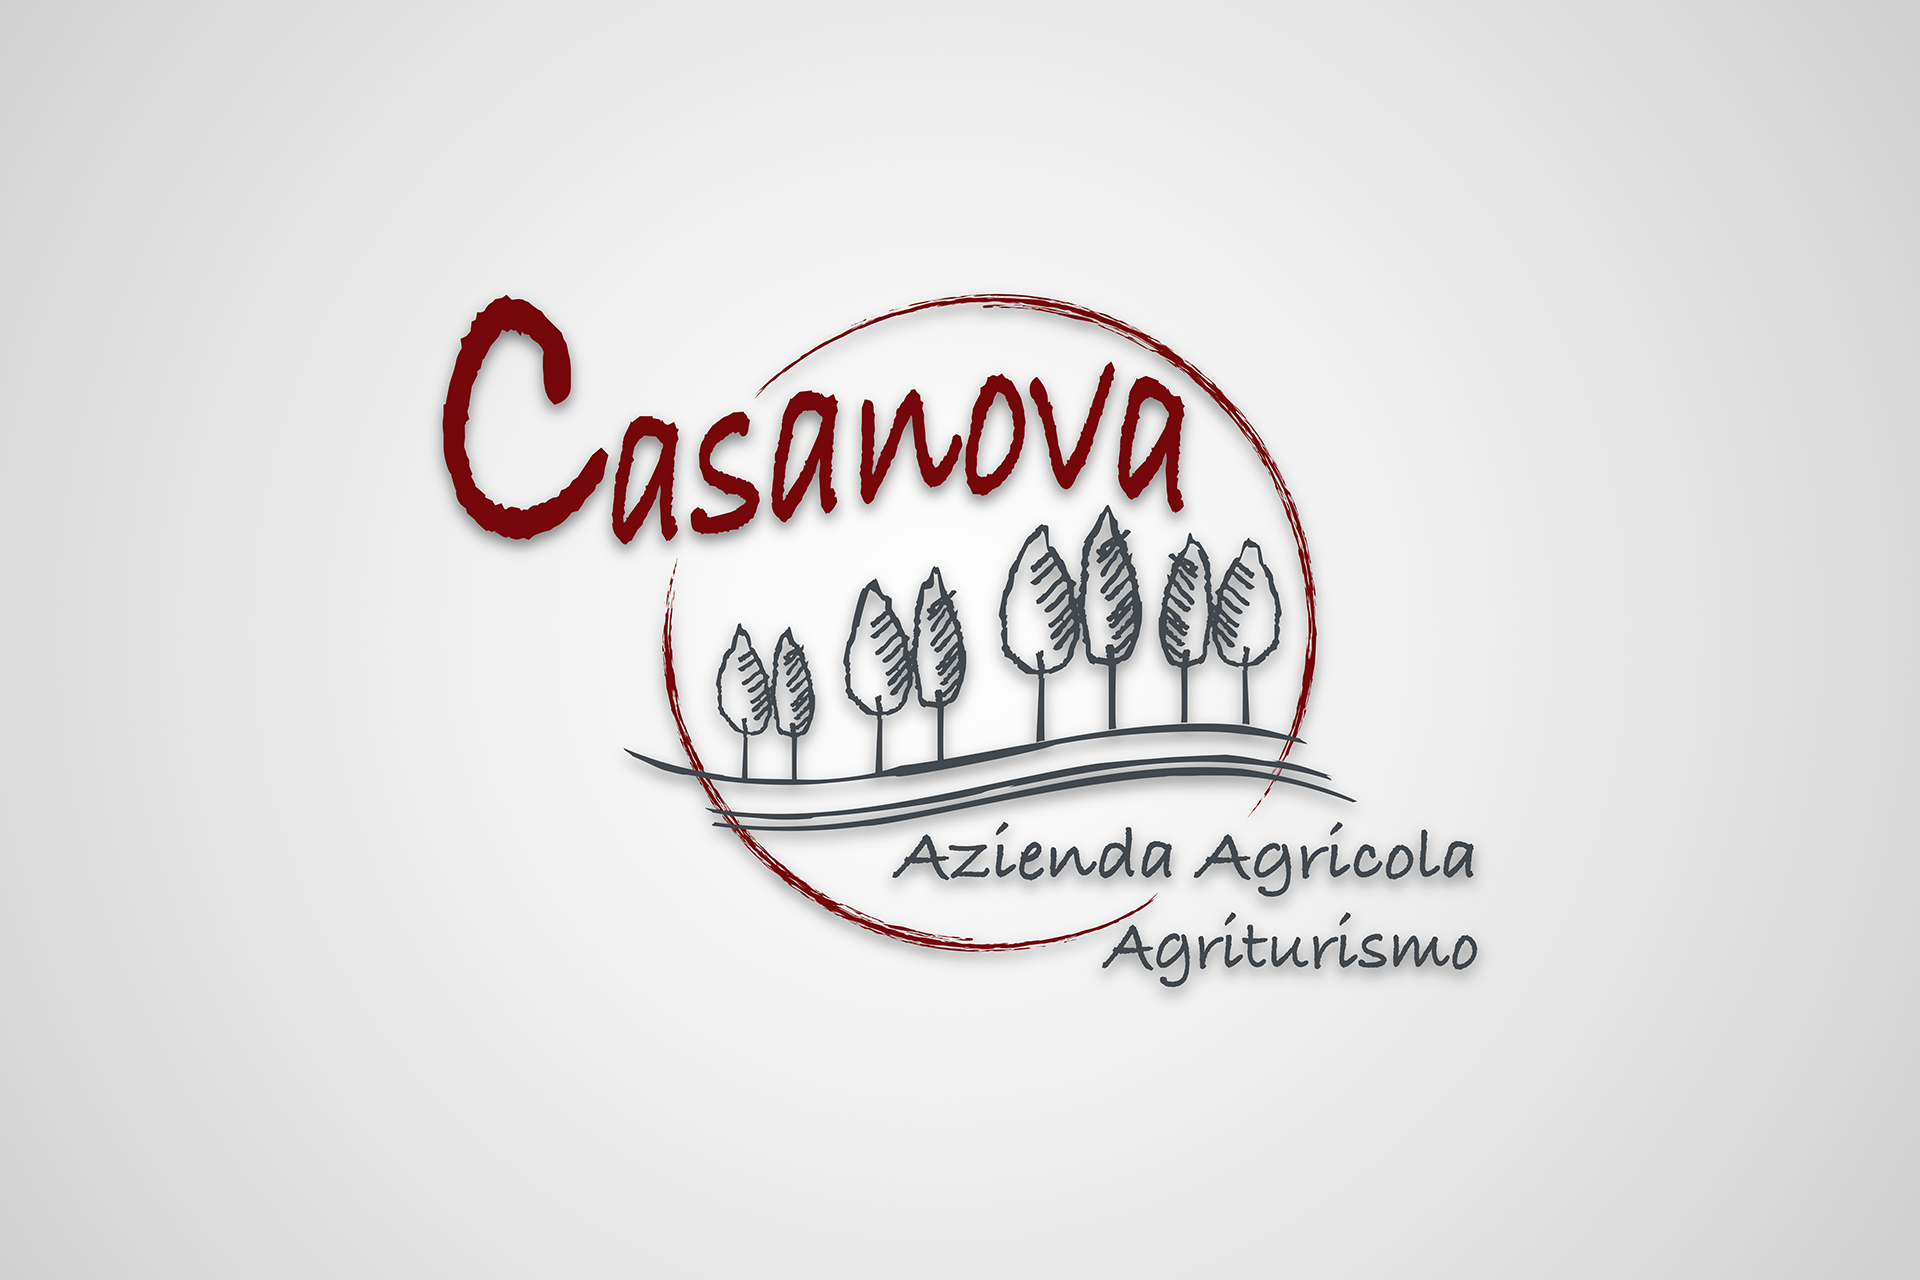 onafez design casanova agriturismo logo azienda agricola